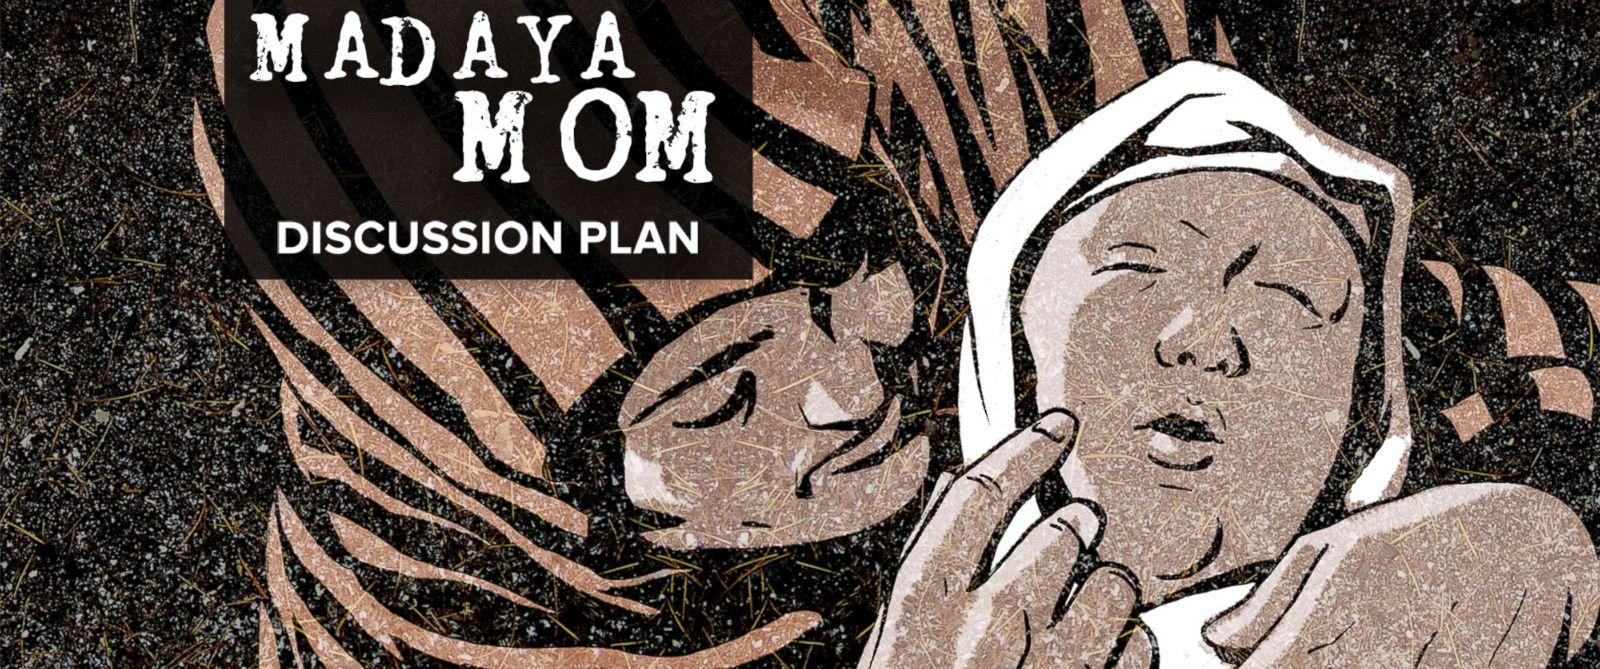 PHOTO: Madaya Mom Discussion Plan